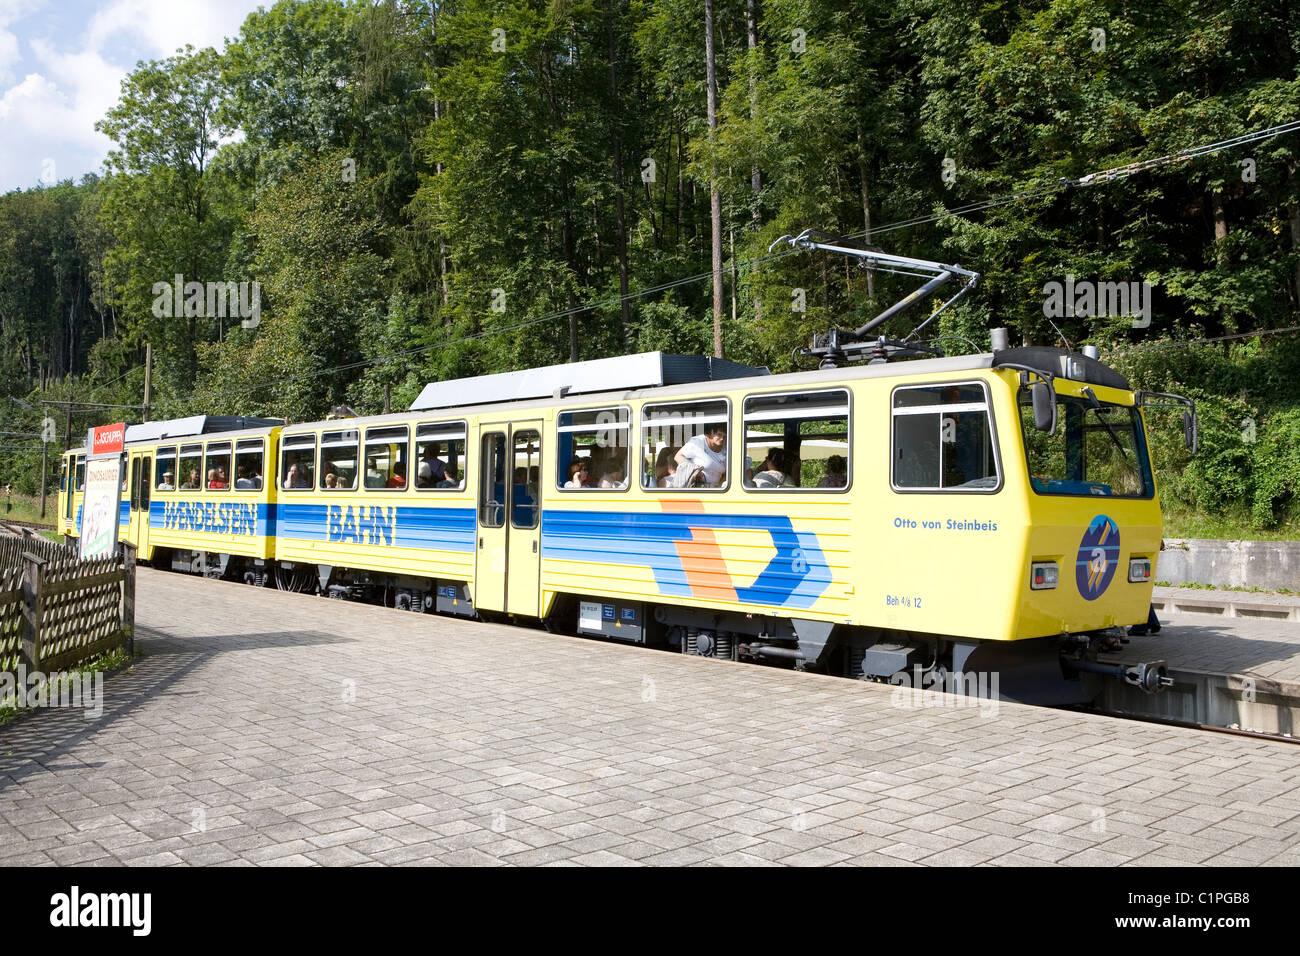 Germany, Wendelsteinbahn, train at platform - Stock Image